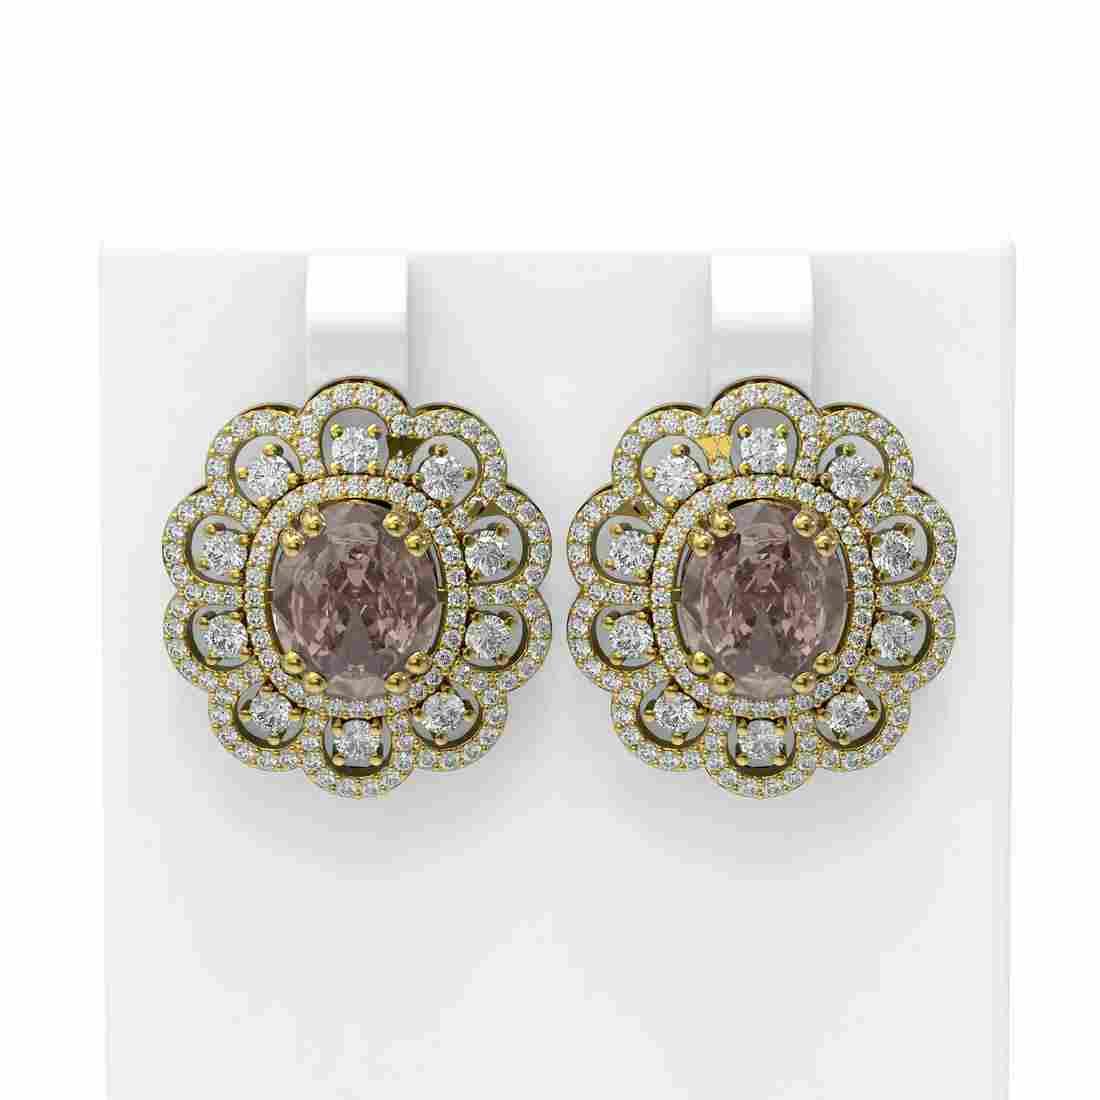 11.61 ctw Morganite & Diamond Earrings 18K Yellow Gold